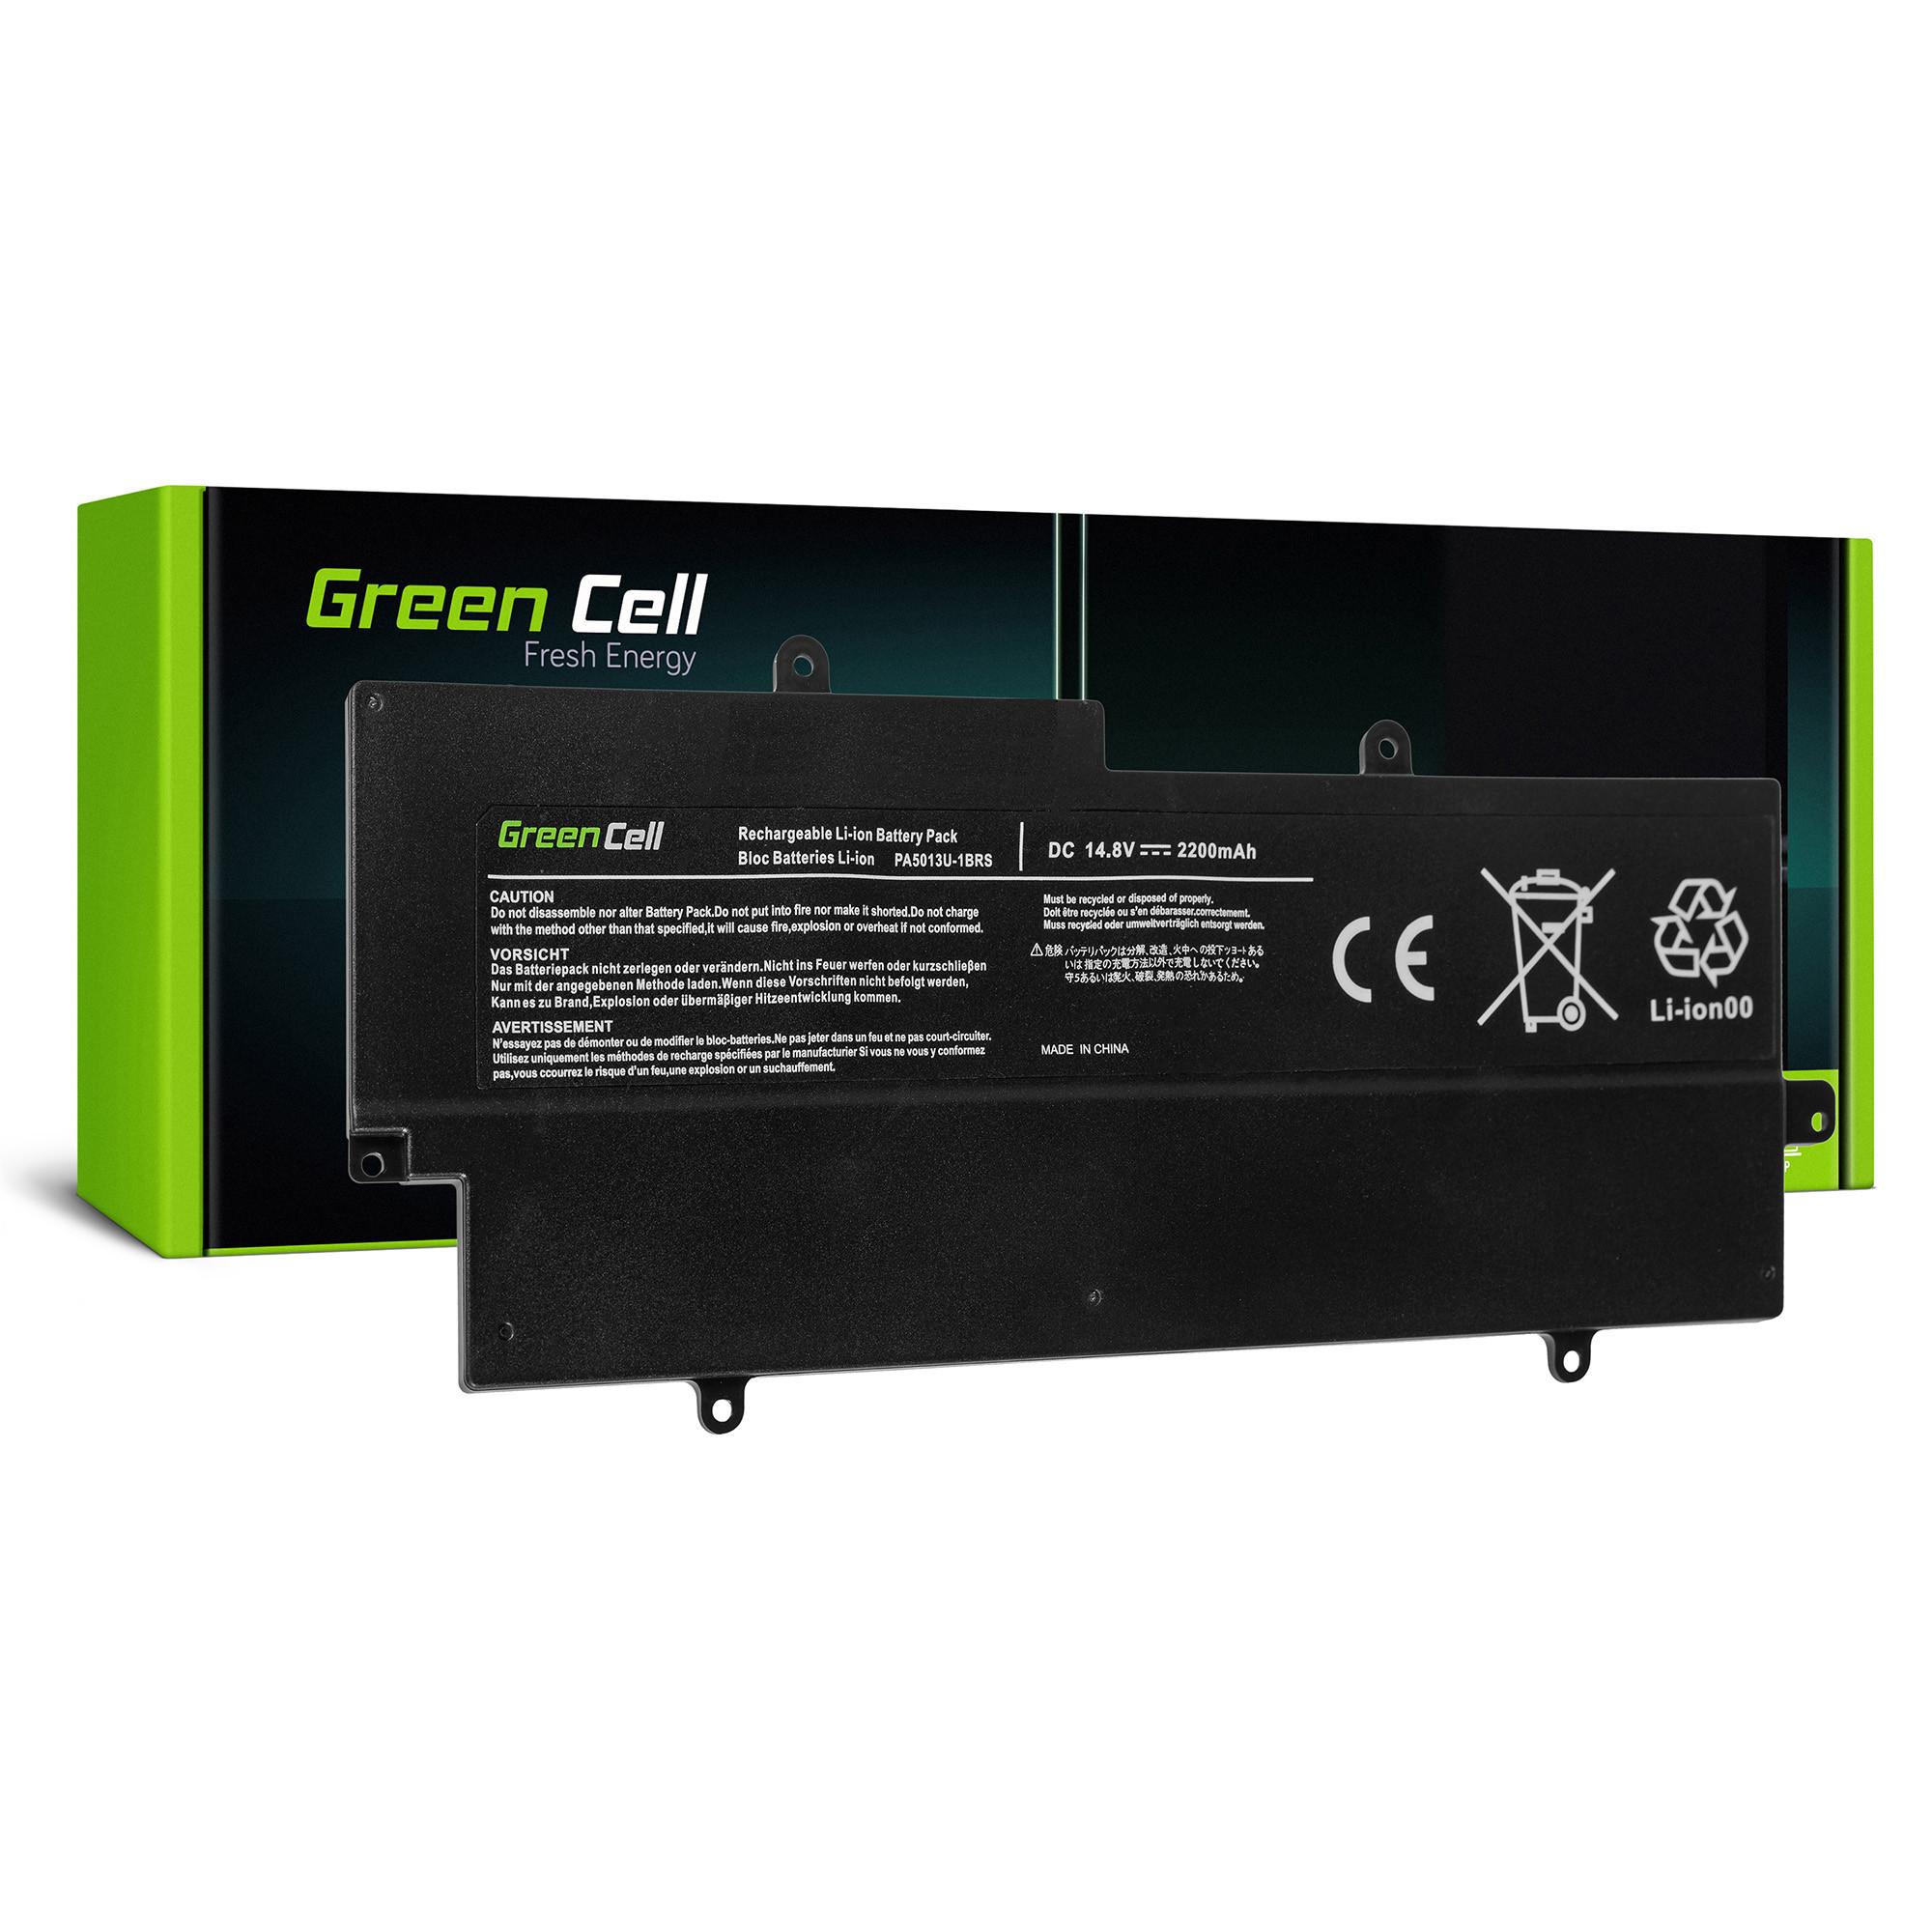 Green Cell TS52 Baterie Toshiba Portege Z830 Z835 Z930 Z935 2000mAh Li-Pol – neoriginální